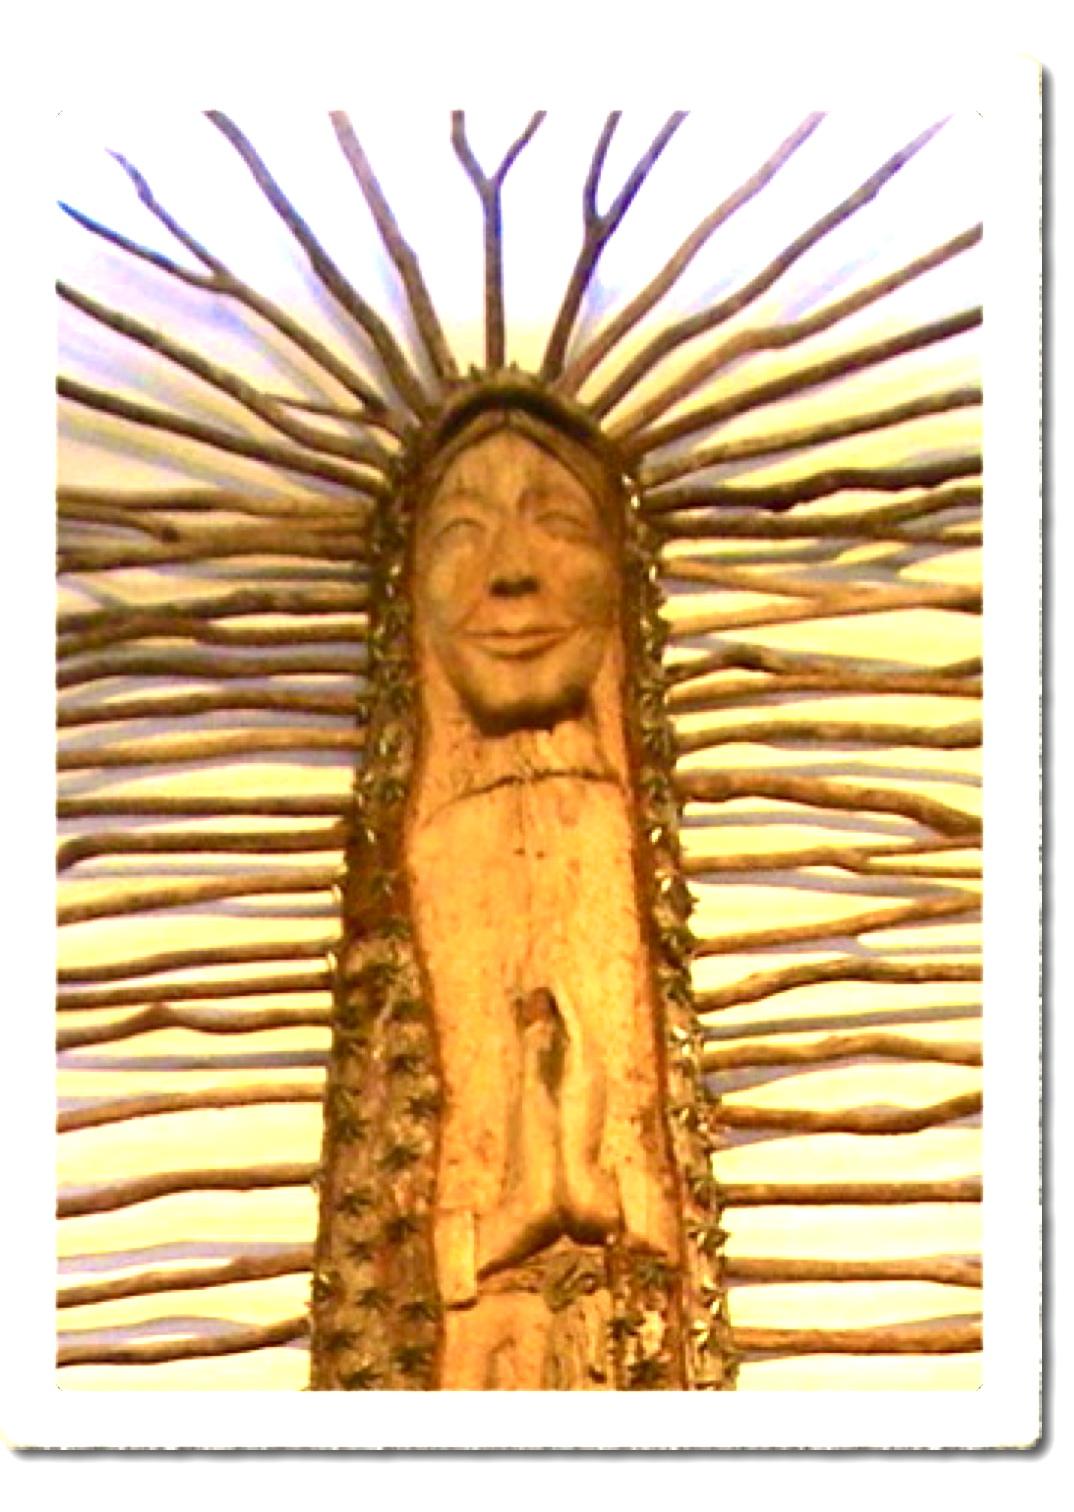 http://4.bp.blogspot.com/-8i6pz4iD0IU/TZToMol-X6I/AAAAAAAAA-w/fihBoC0xfi8/s1600/tree+goddess.jpeg